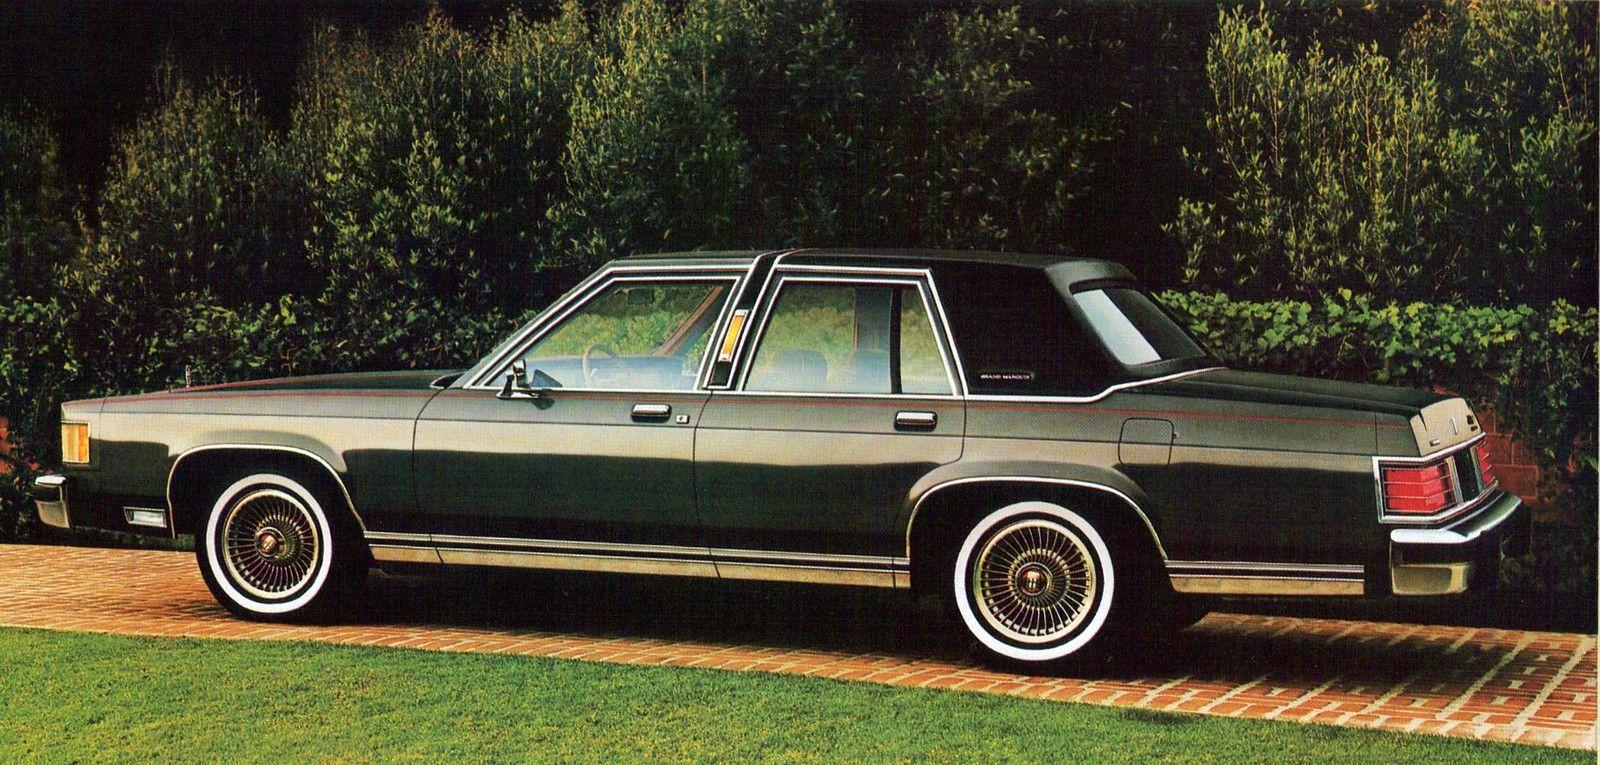 1982 Mercury Grand Marquis 4 Door Sedan in 2020 Grand